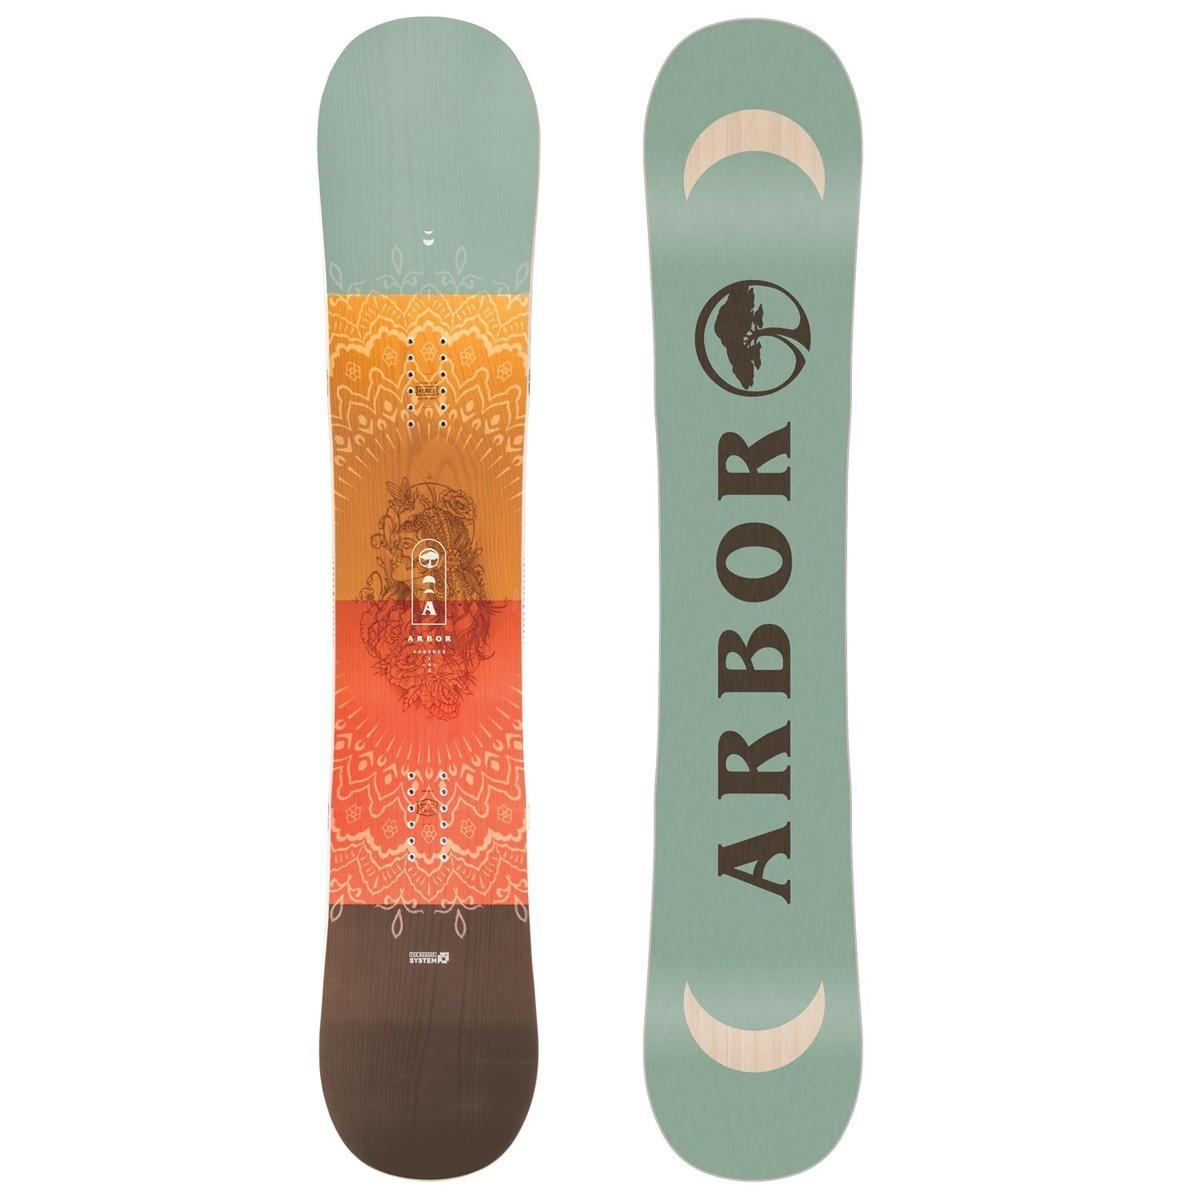 Унисекс или женский сноуборд